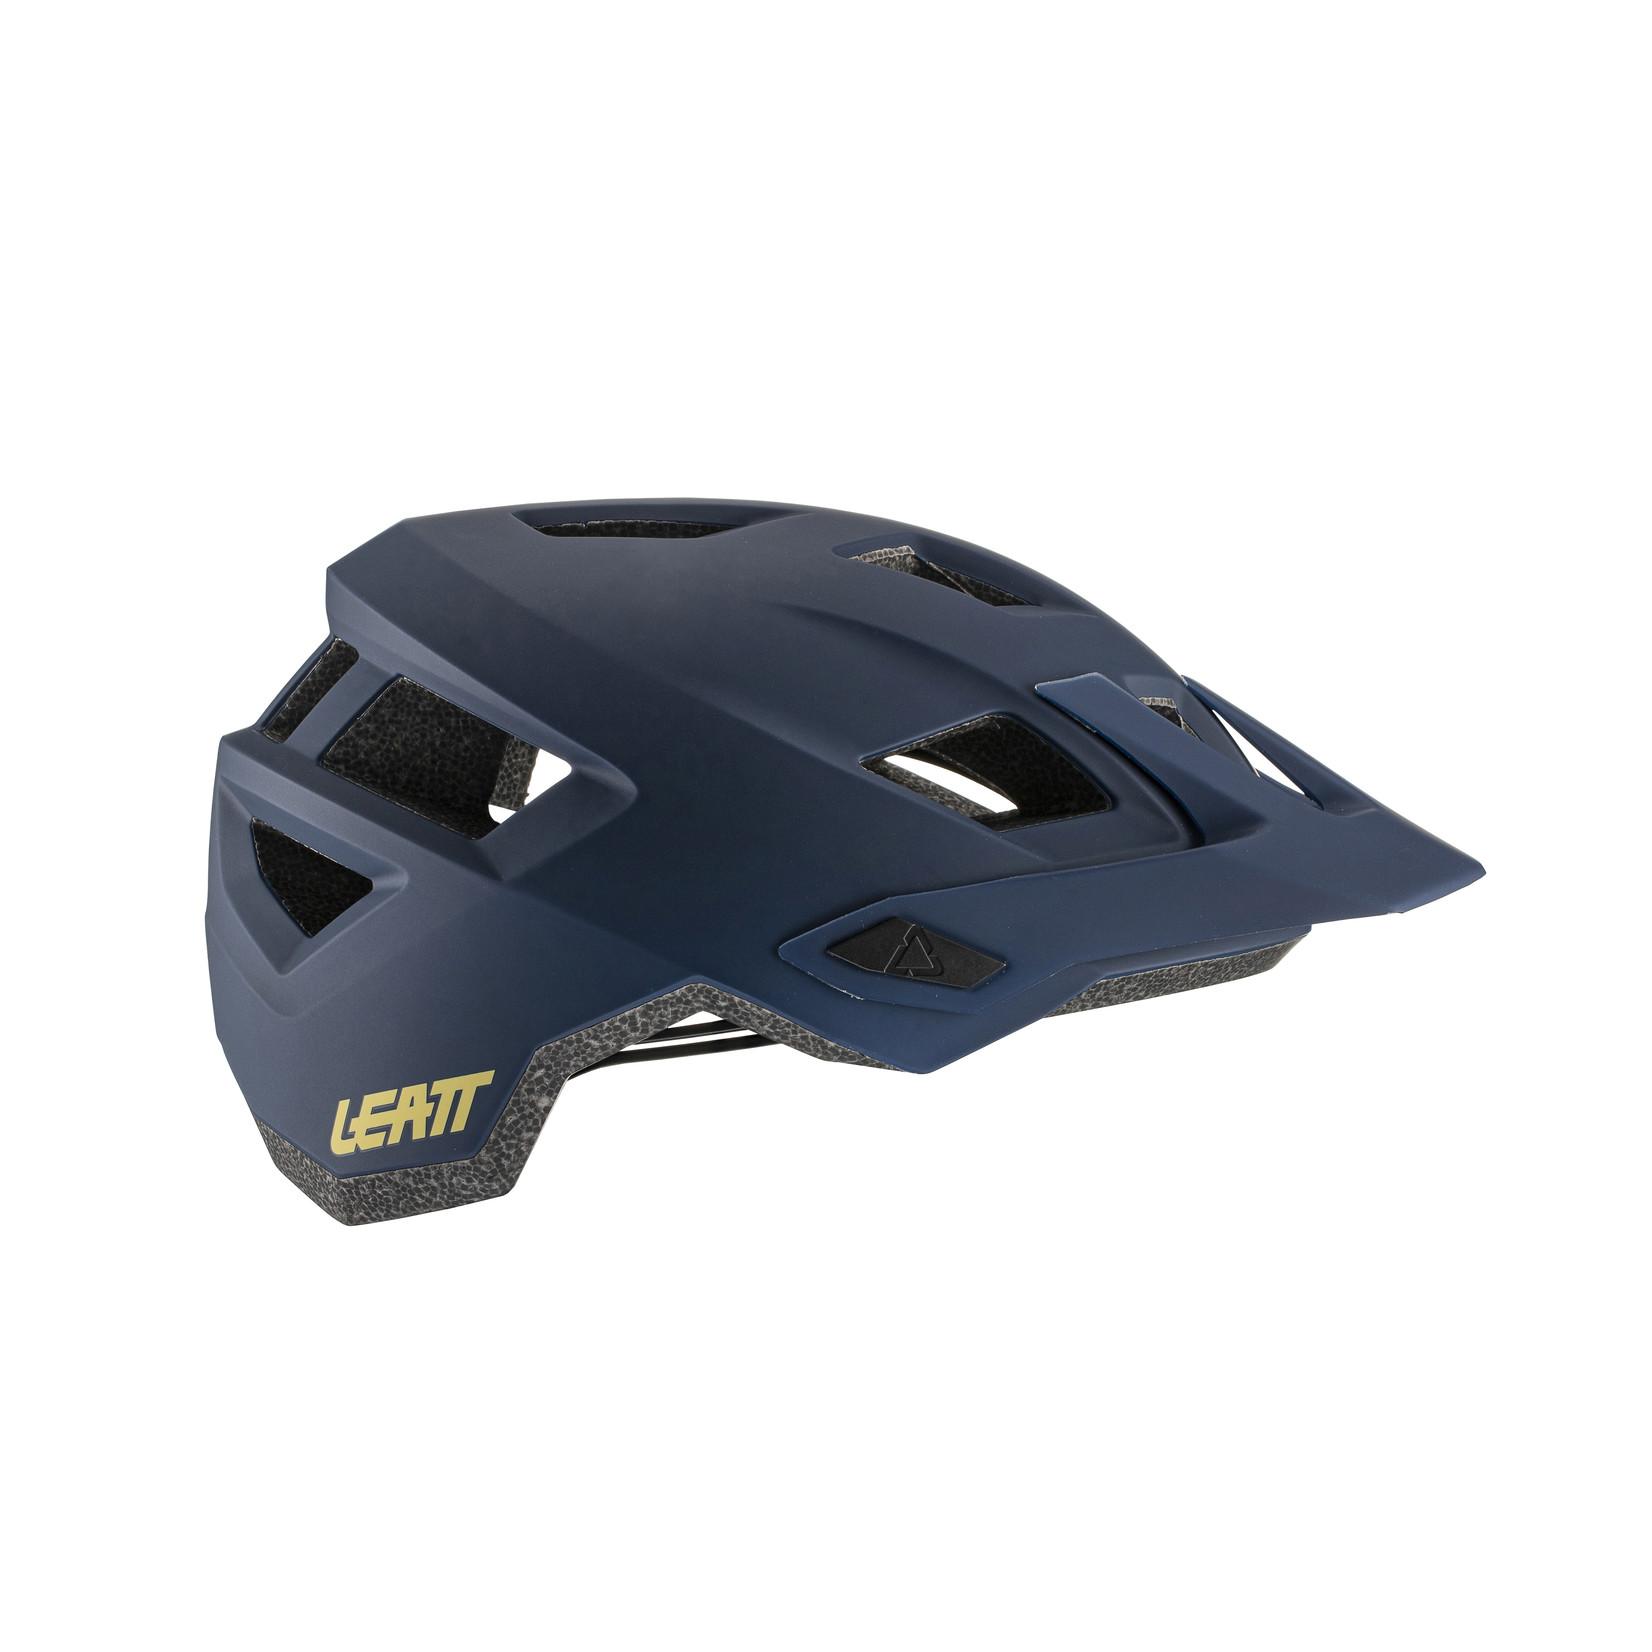 Leatt MTB Helmet 1.0 - Onyx Medium (55-59cm)